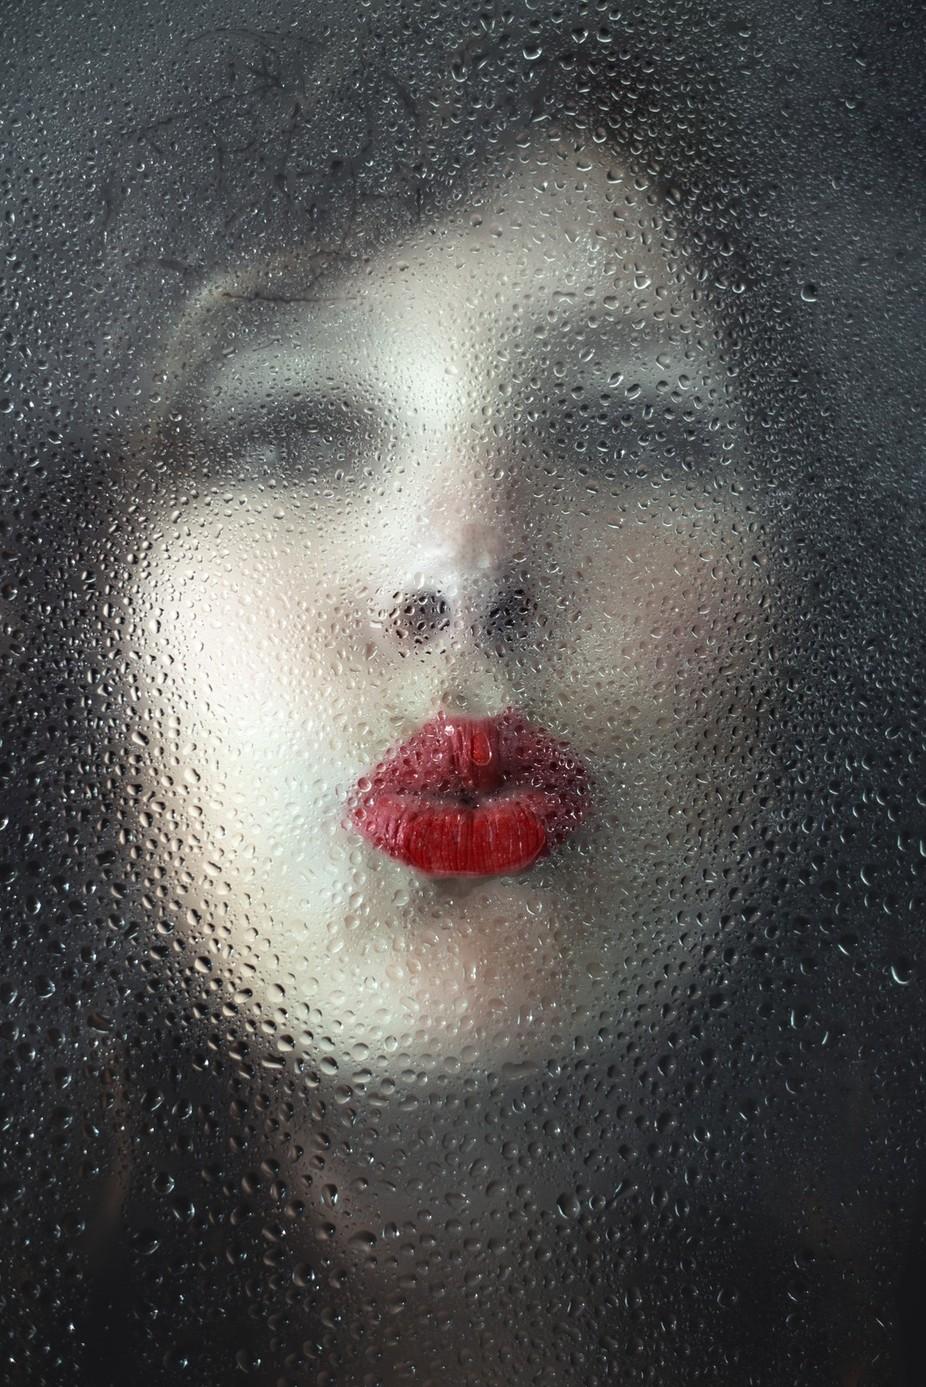 Kiss by chris-herzog - Showcase Lips Photo Contest